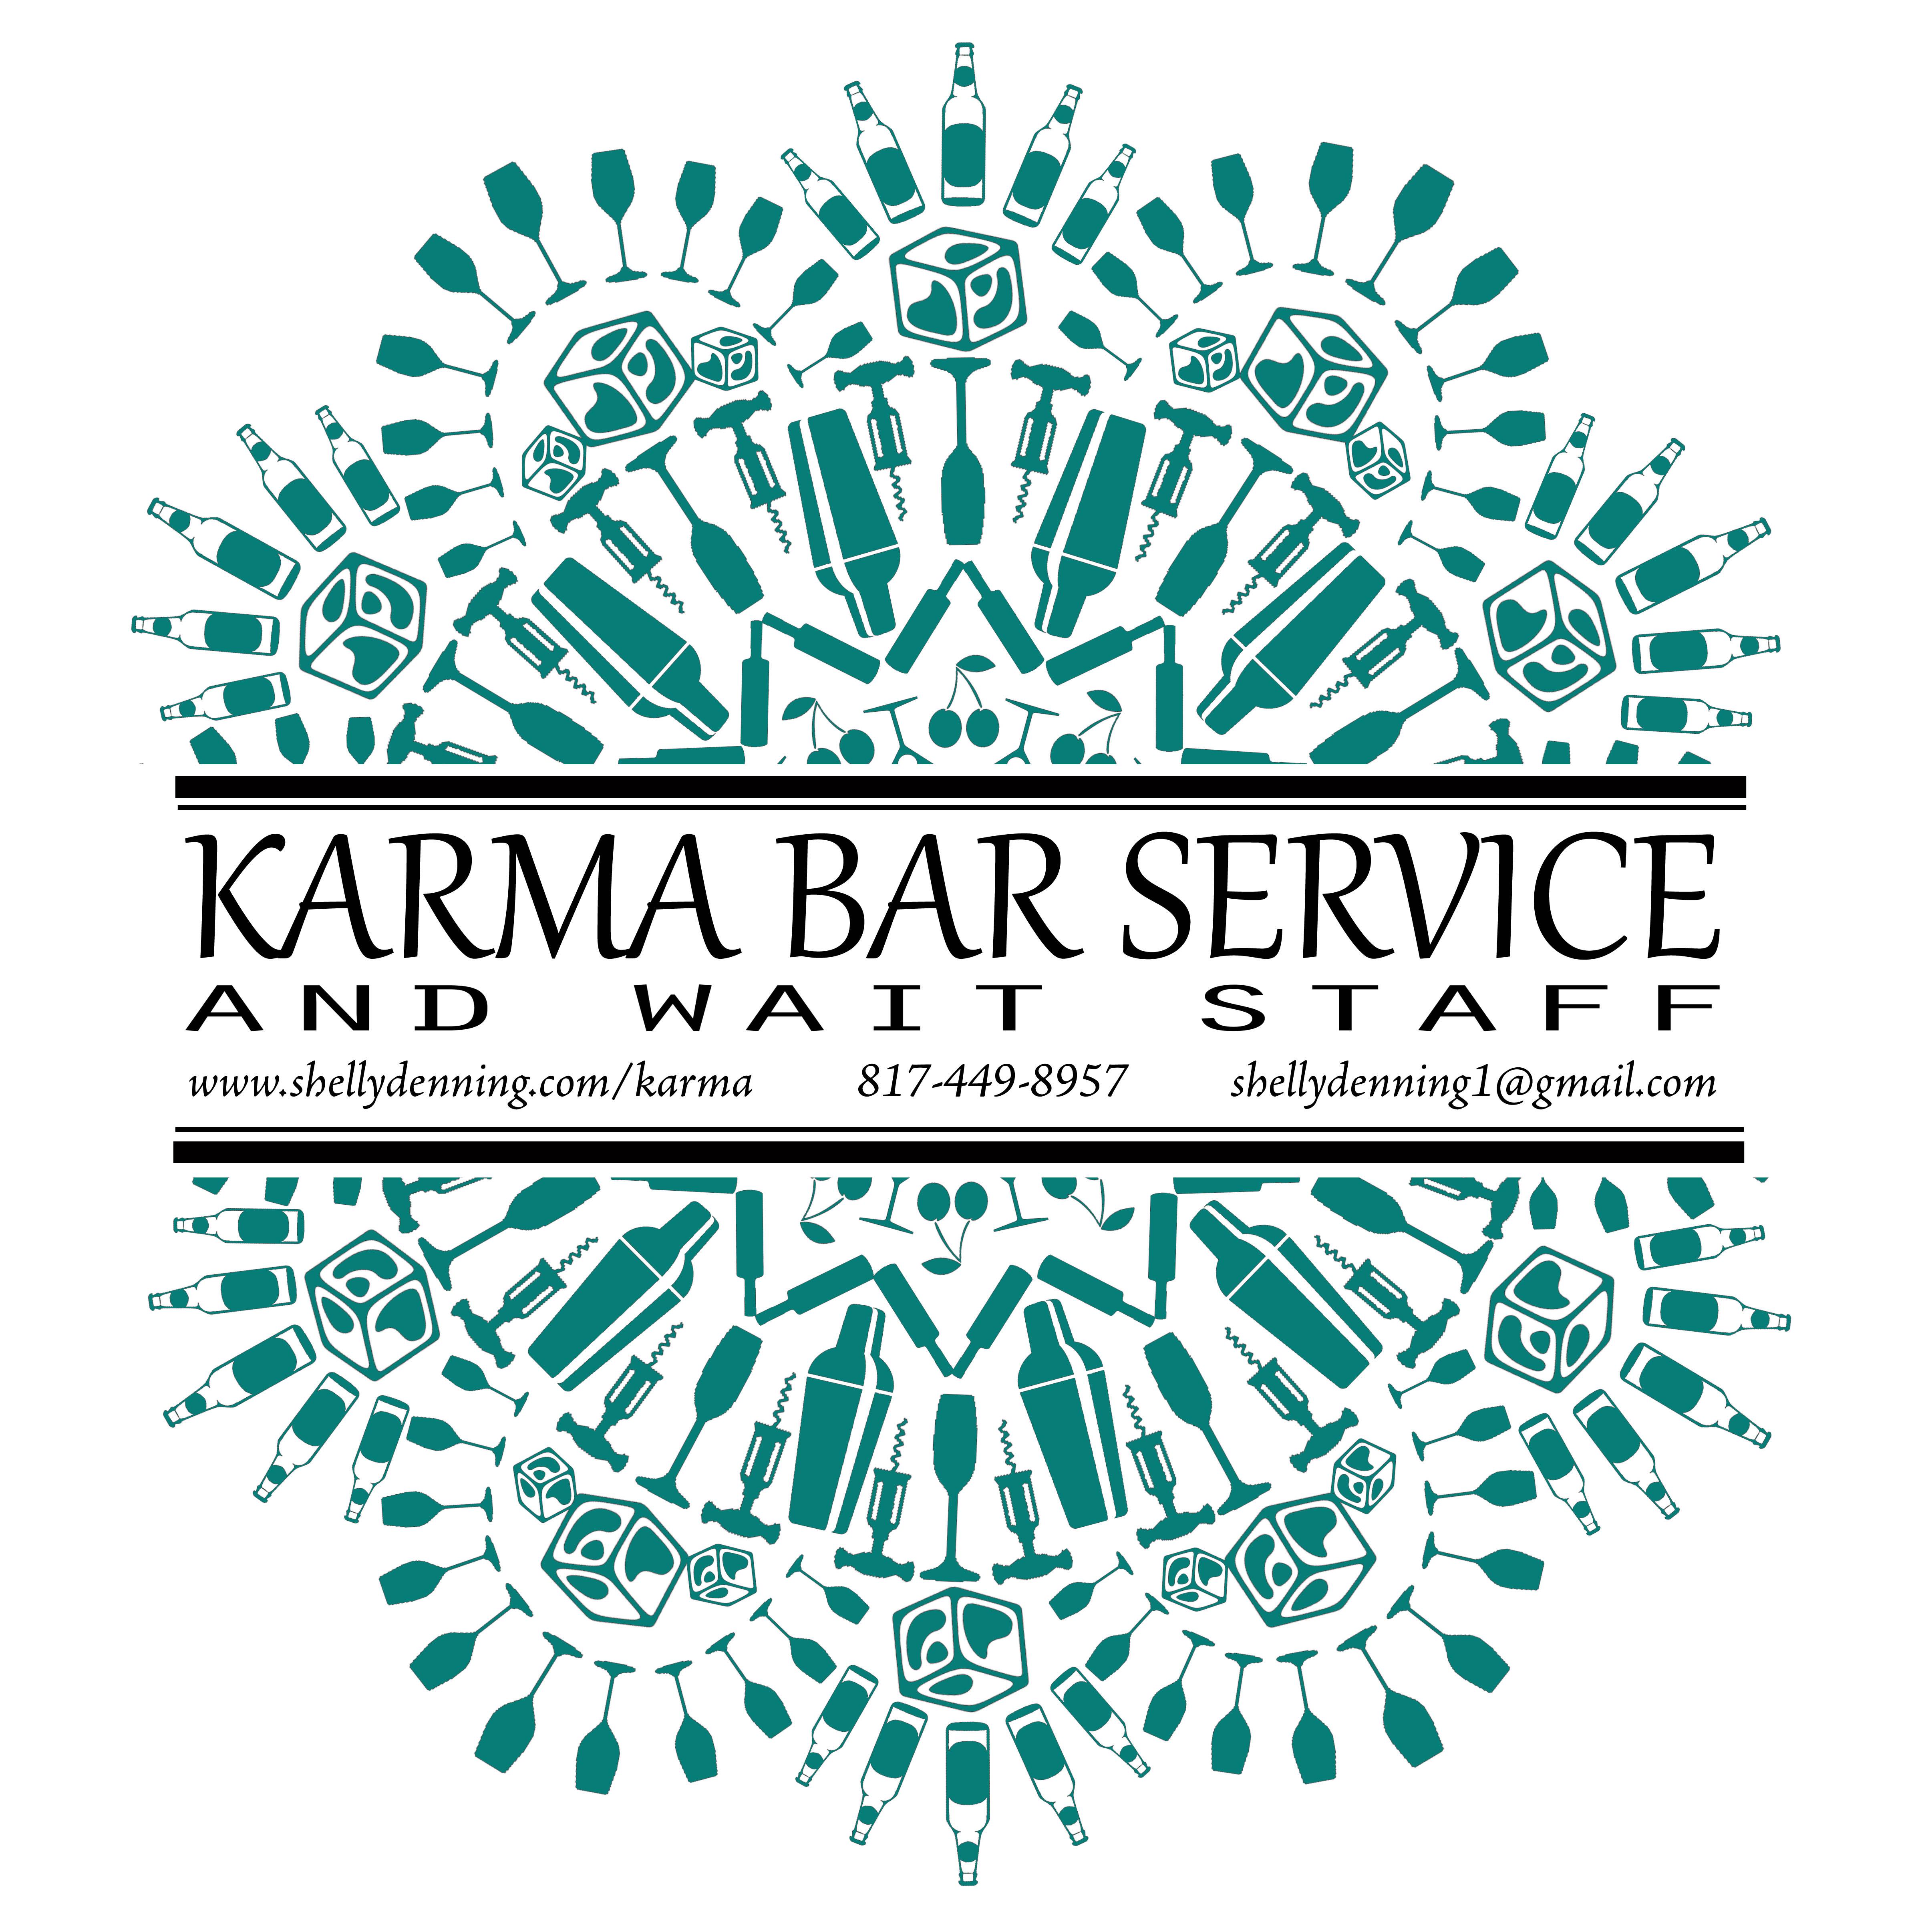 Karma full logo with contact